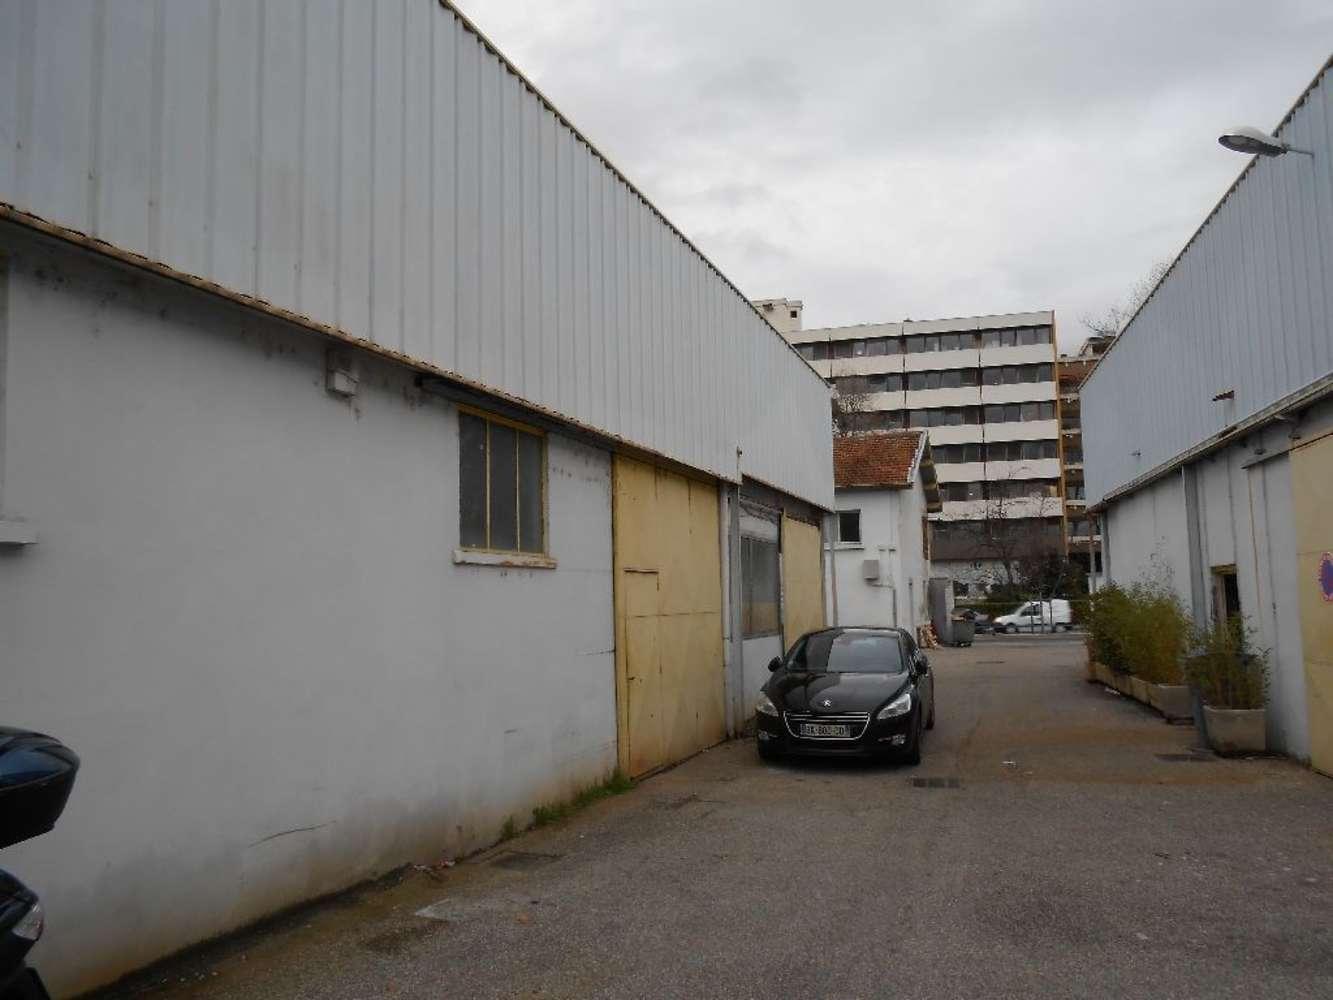 Activités/entrepôt Villeurbanne, 69100 - Location entrepot Villeurbanne ( Lyon) - 9764777